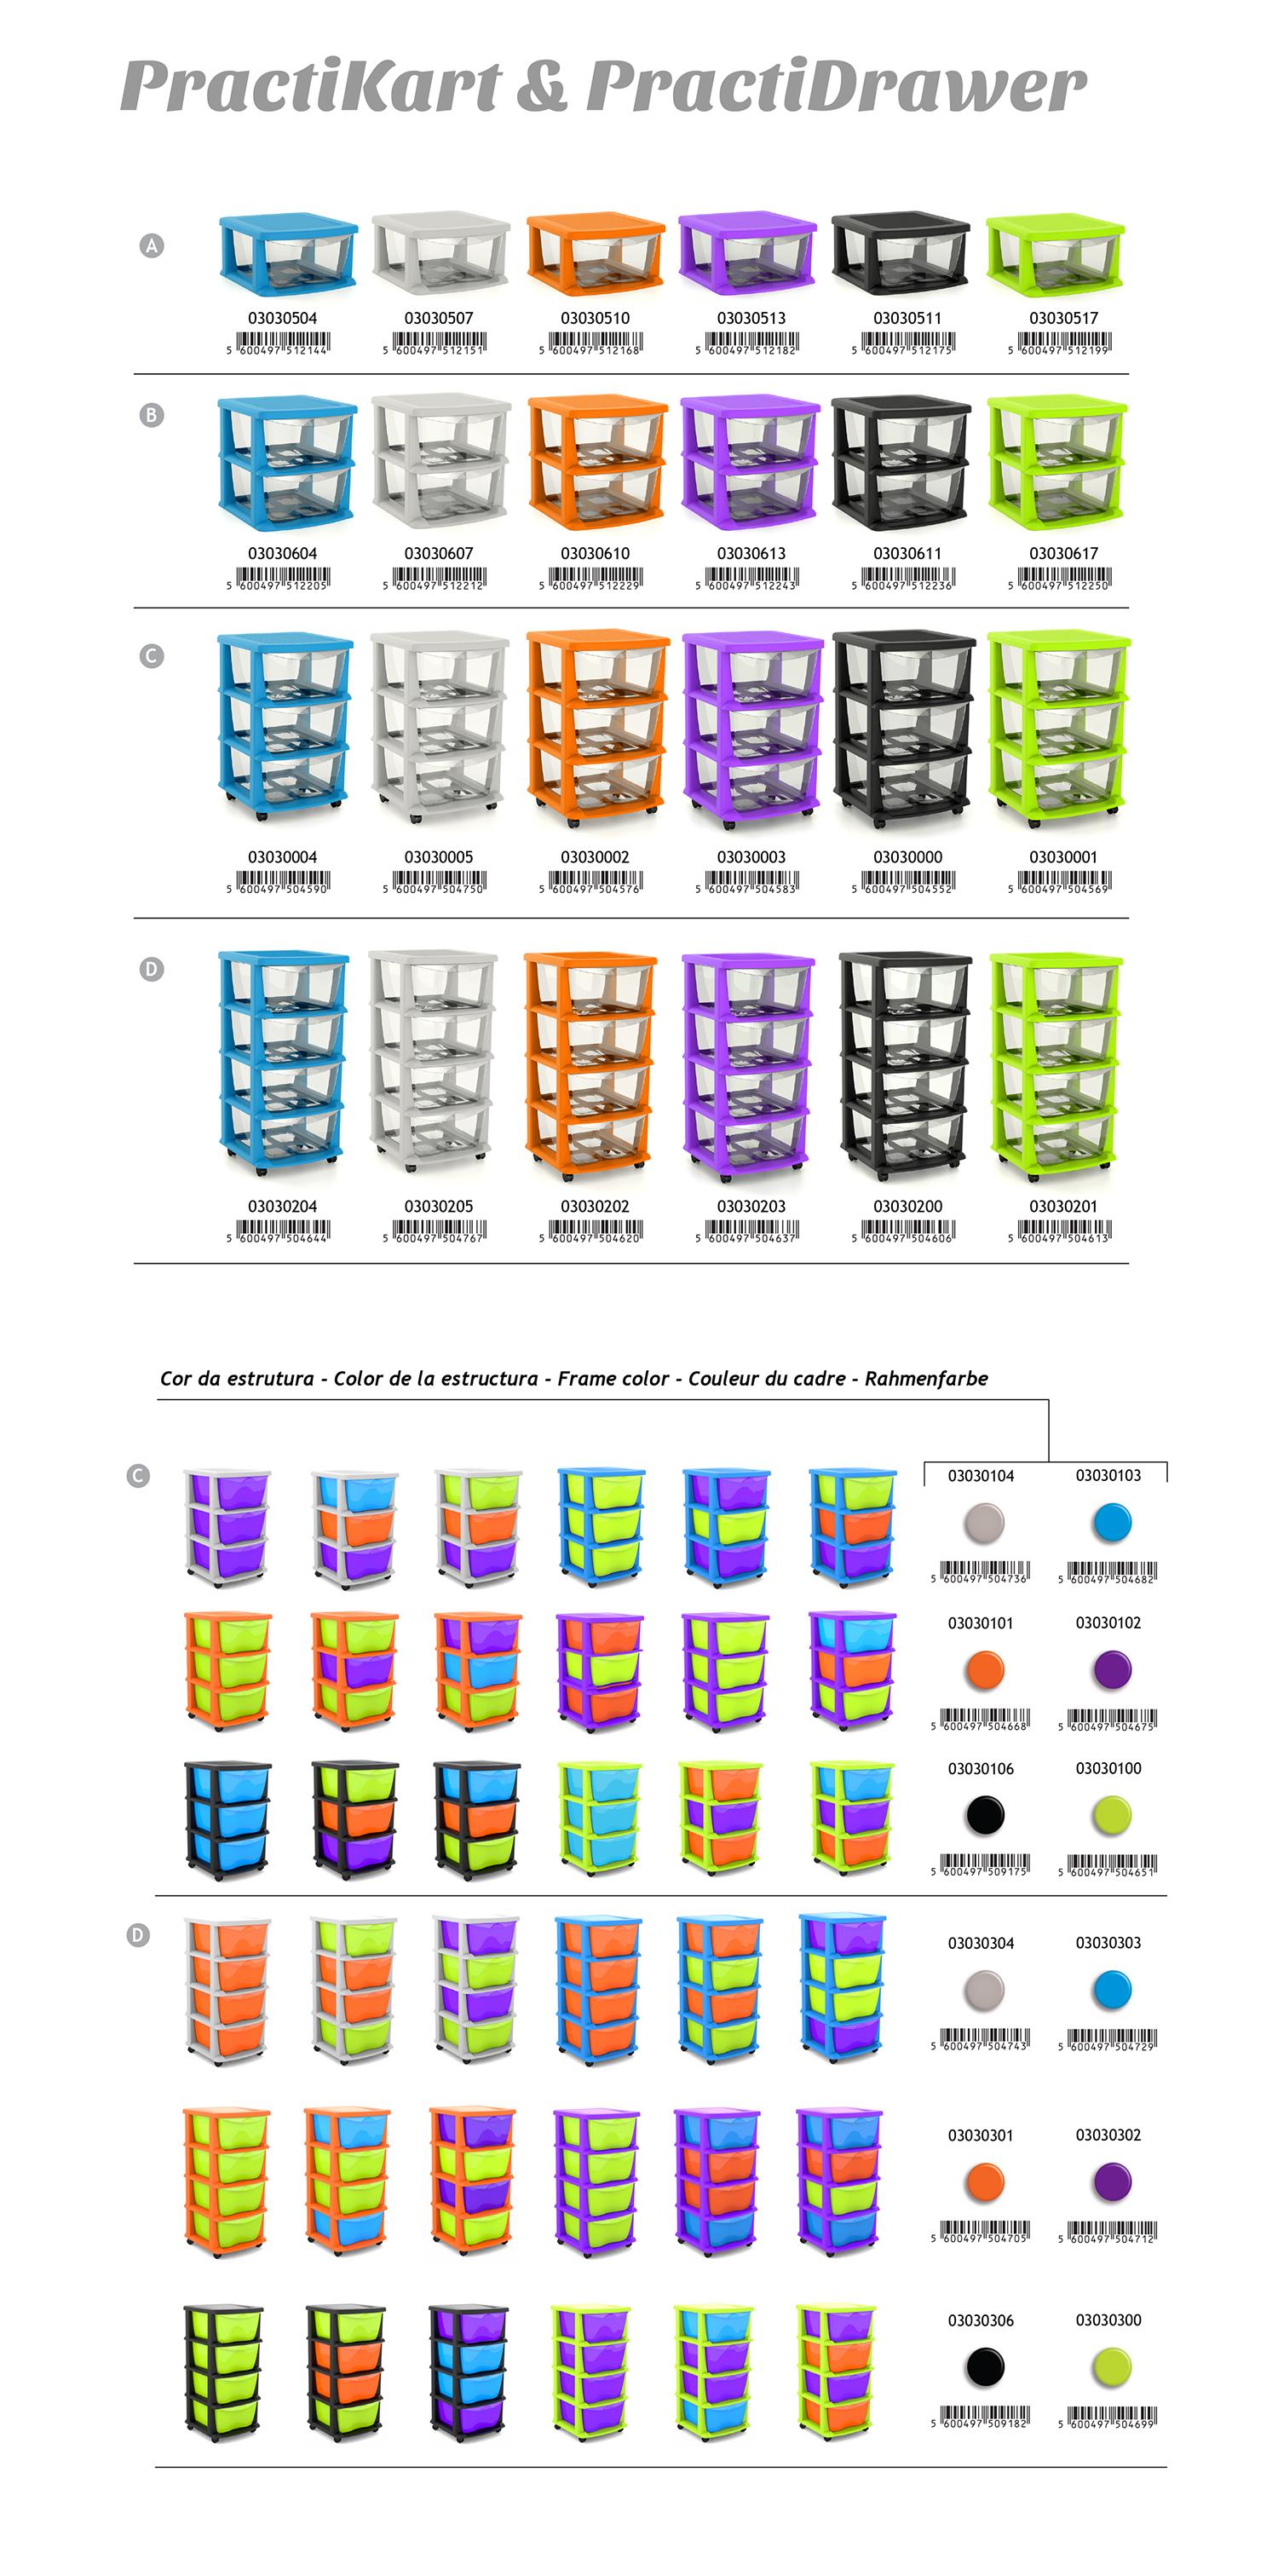 PractiKart Colores